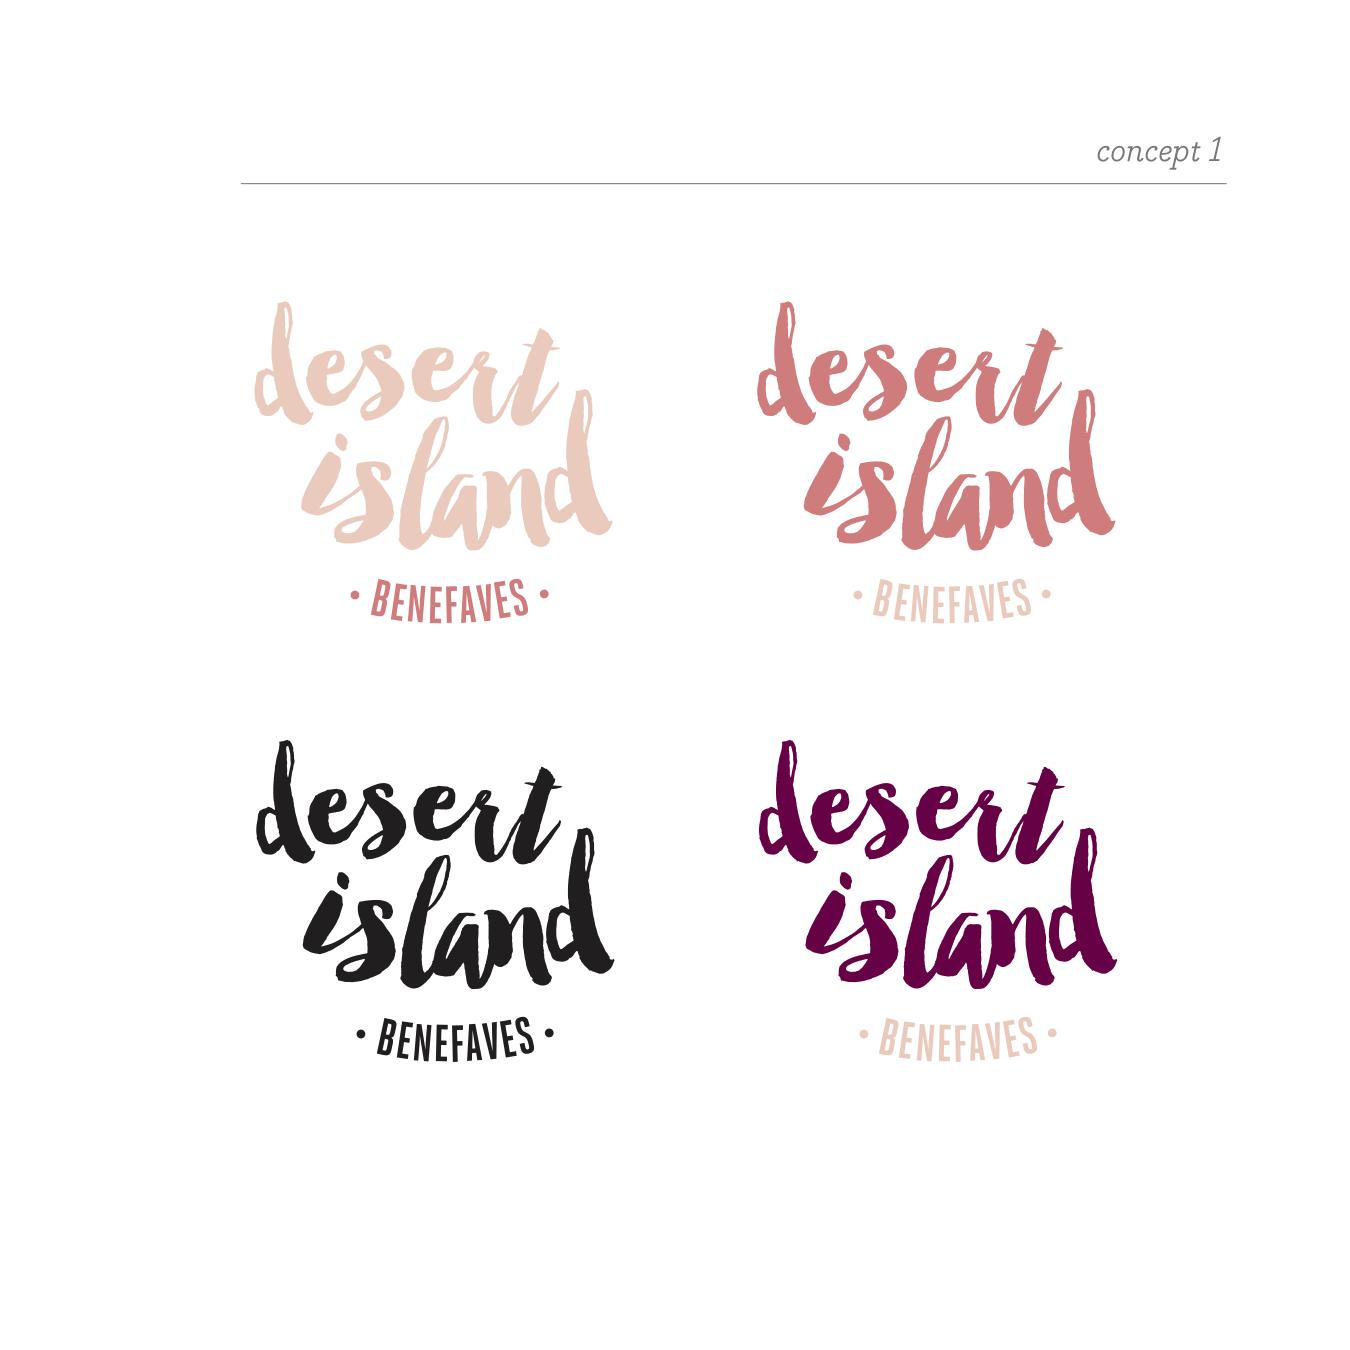 desert-island-sketches_05-03-17_p2.jpg